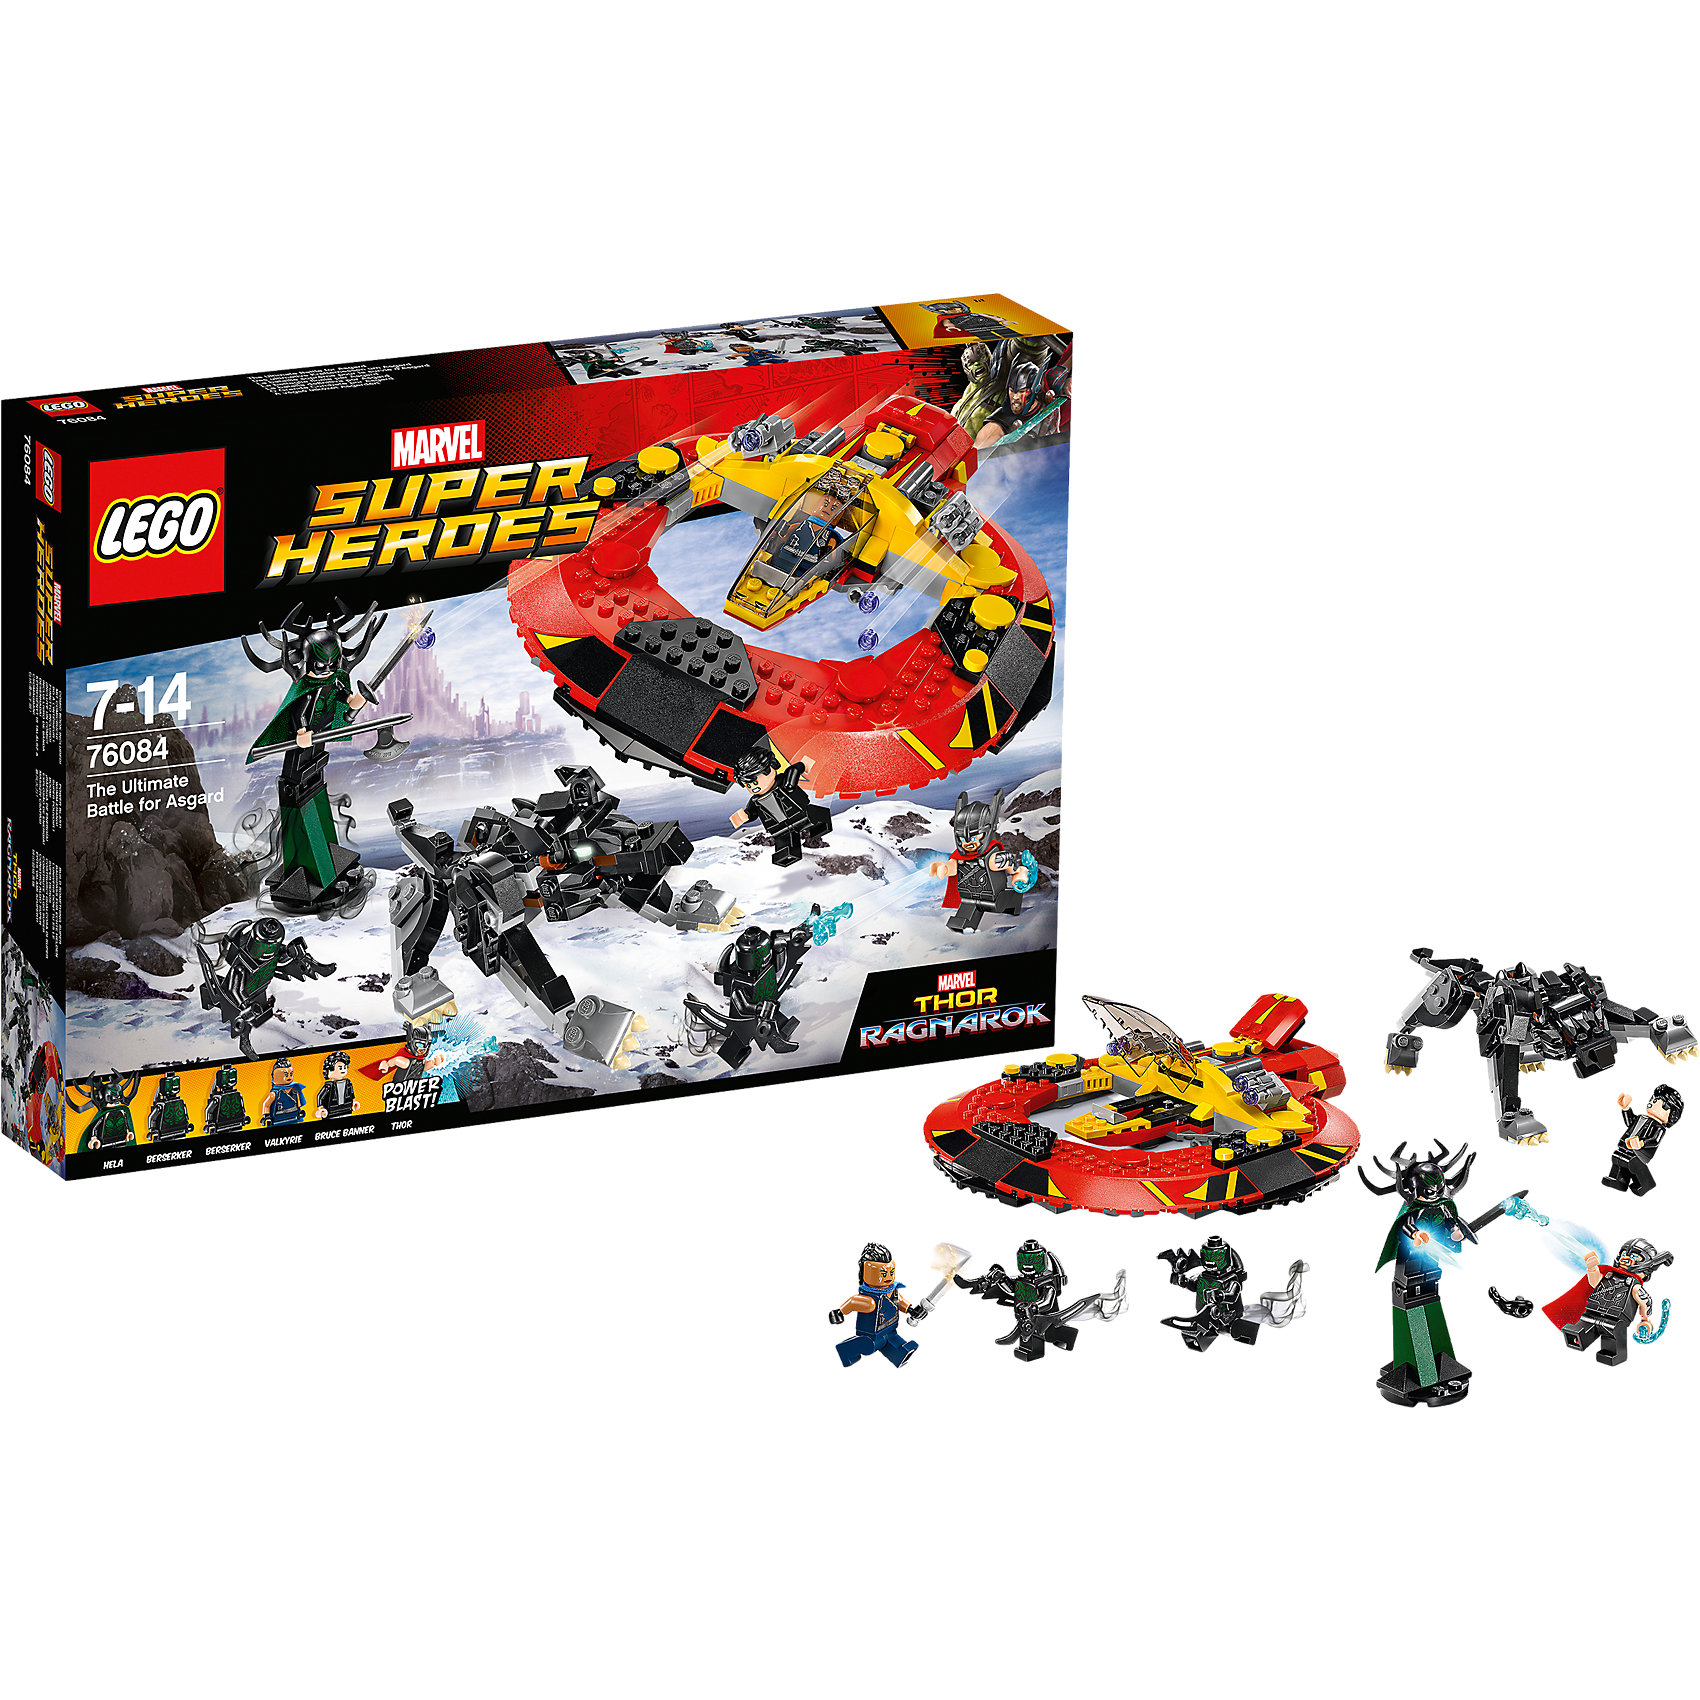 LEGO Super Heroes 76084: Решающая битва за АсгардПластмассовые конструкторы<br><br><br>Ширина мм: 382<br>Глубина мм: 262<br>Высота мм: 57<br>Вес г: 660<br>Возраст от месяцев: 84<br>Возраст до месяцев: 168<br>Пол: Мужской<br>Возраст: Детский<br>SKU: 5620011